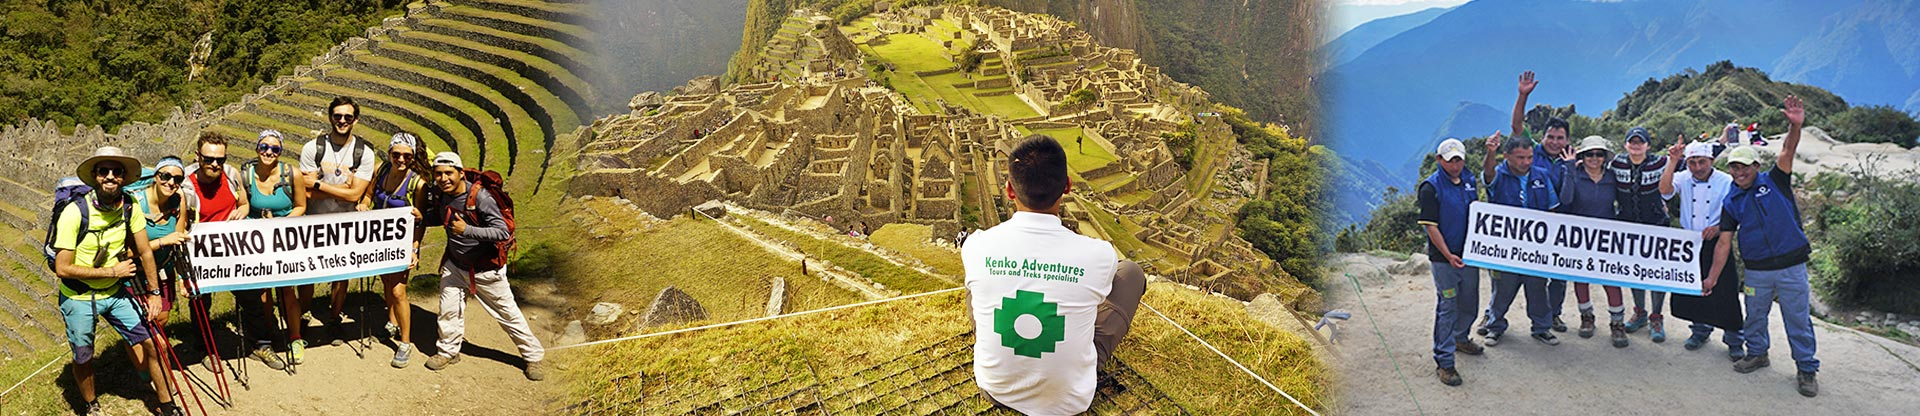 About Kenko Adventures, Inca Trail & Treks specialist